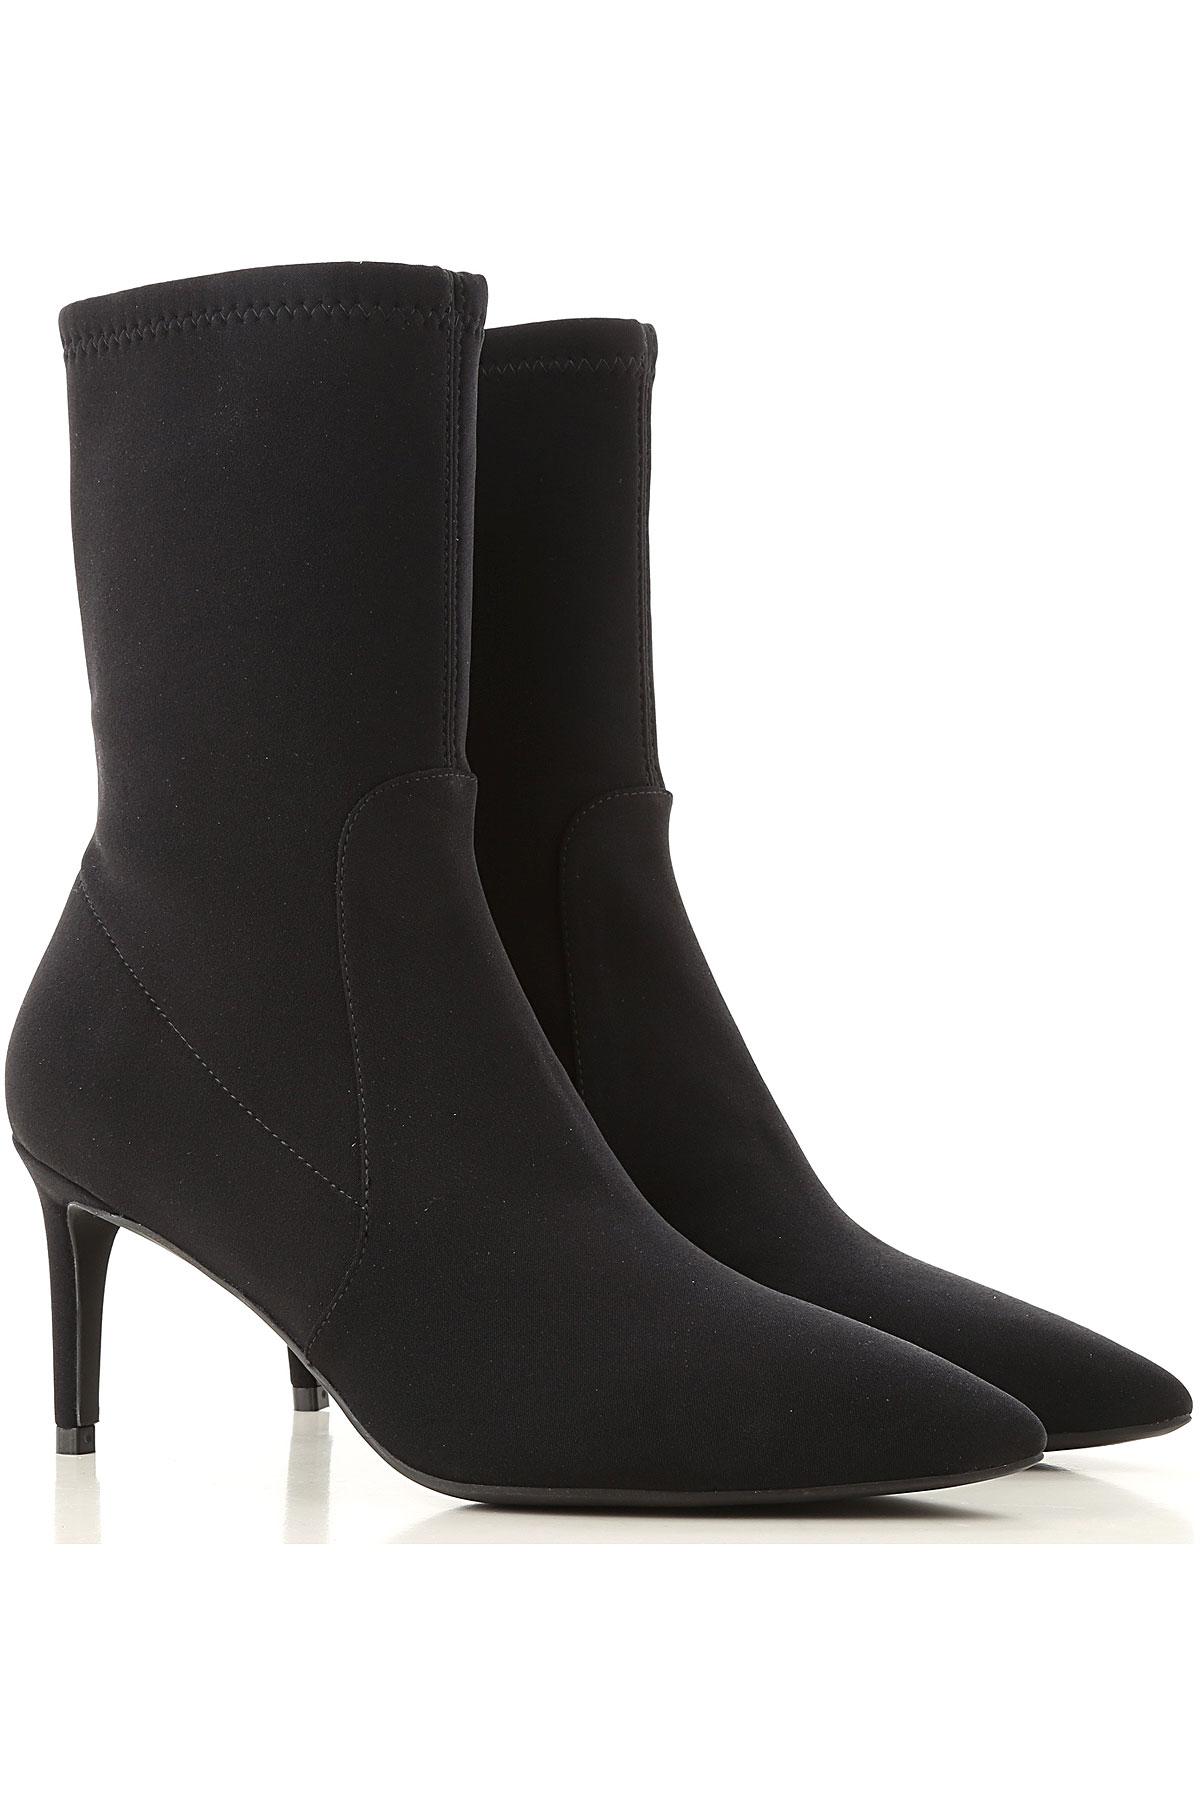 Stuart Weitzman Boots for Women, Booties On Sale, Black, Fabric, 2019, US 8 (EU 38.5)